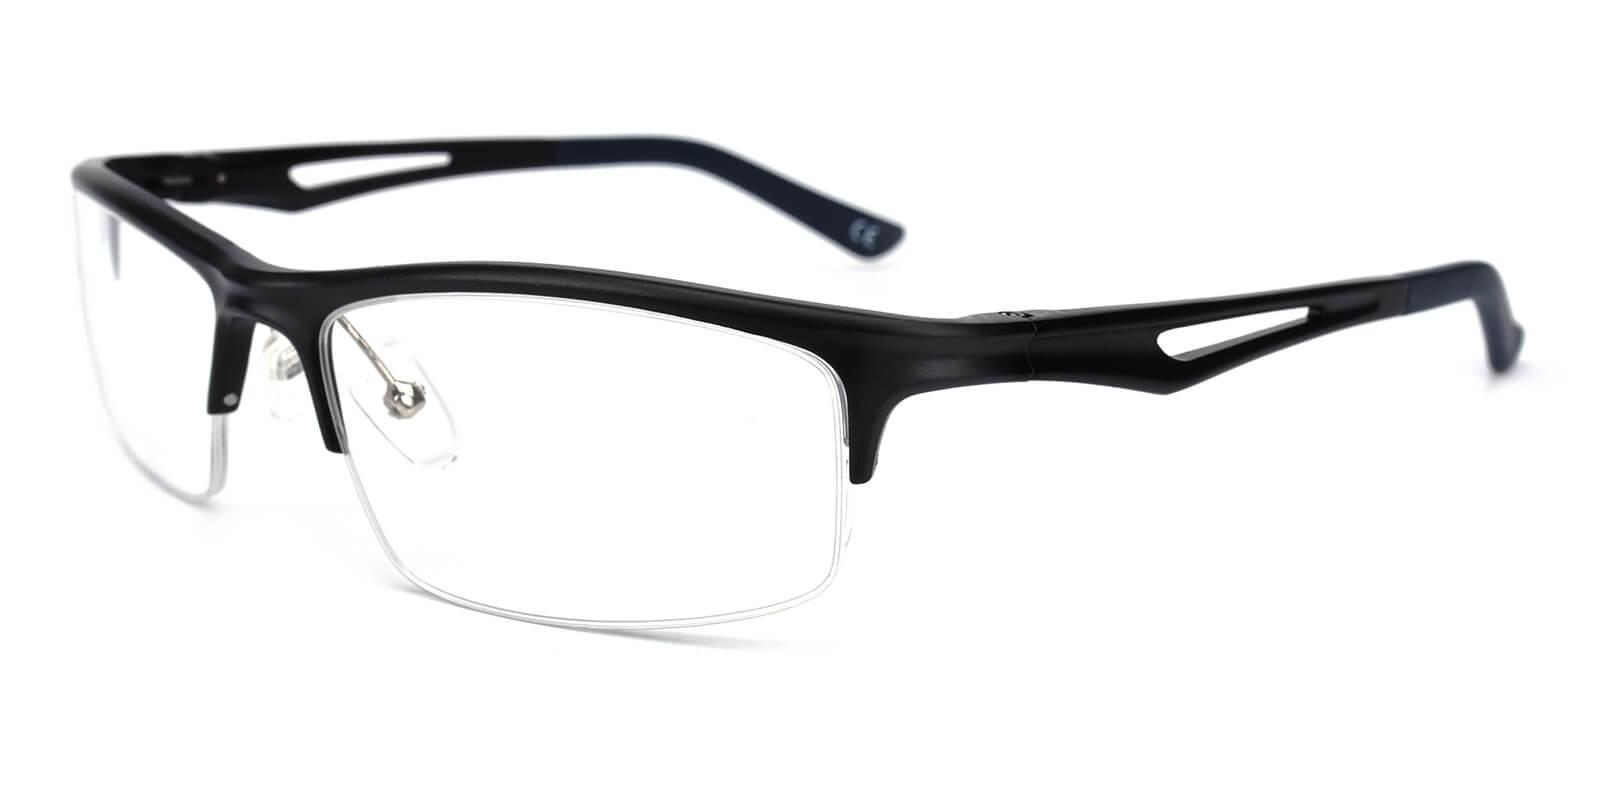 Muhammad-Black-Rectangle-Metal-Eyeglasses-additional1